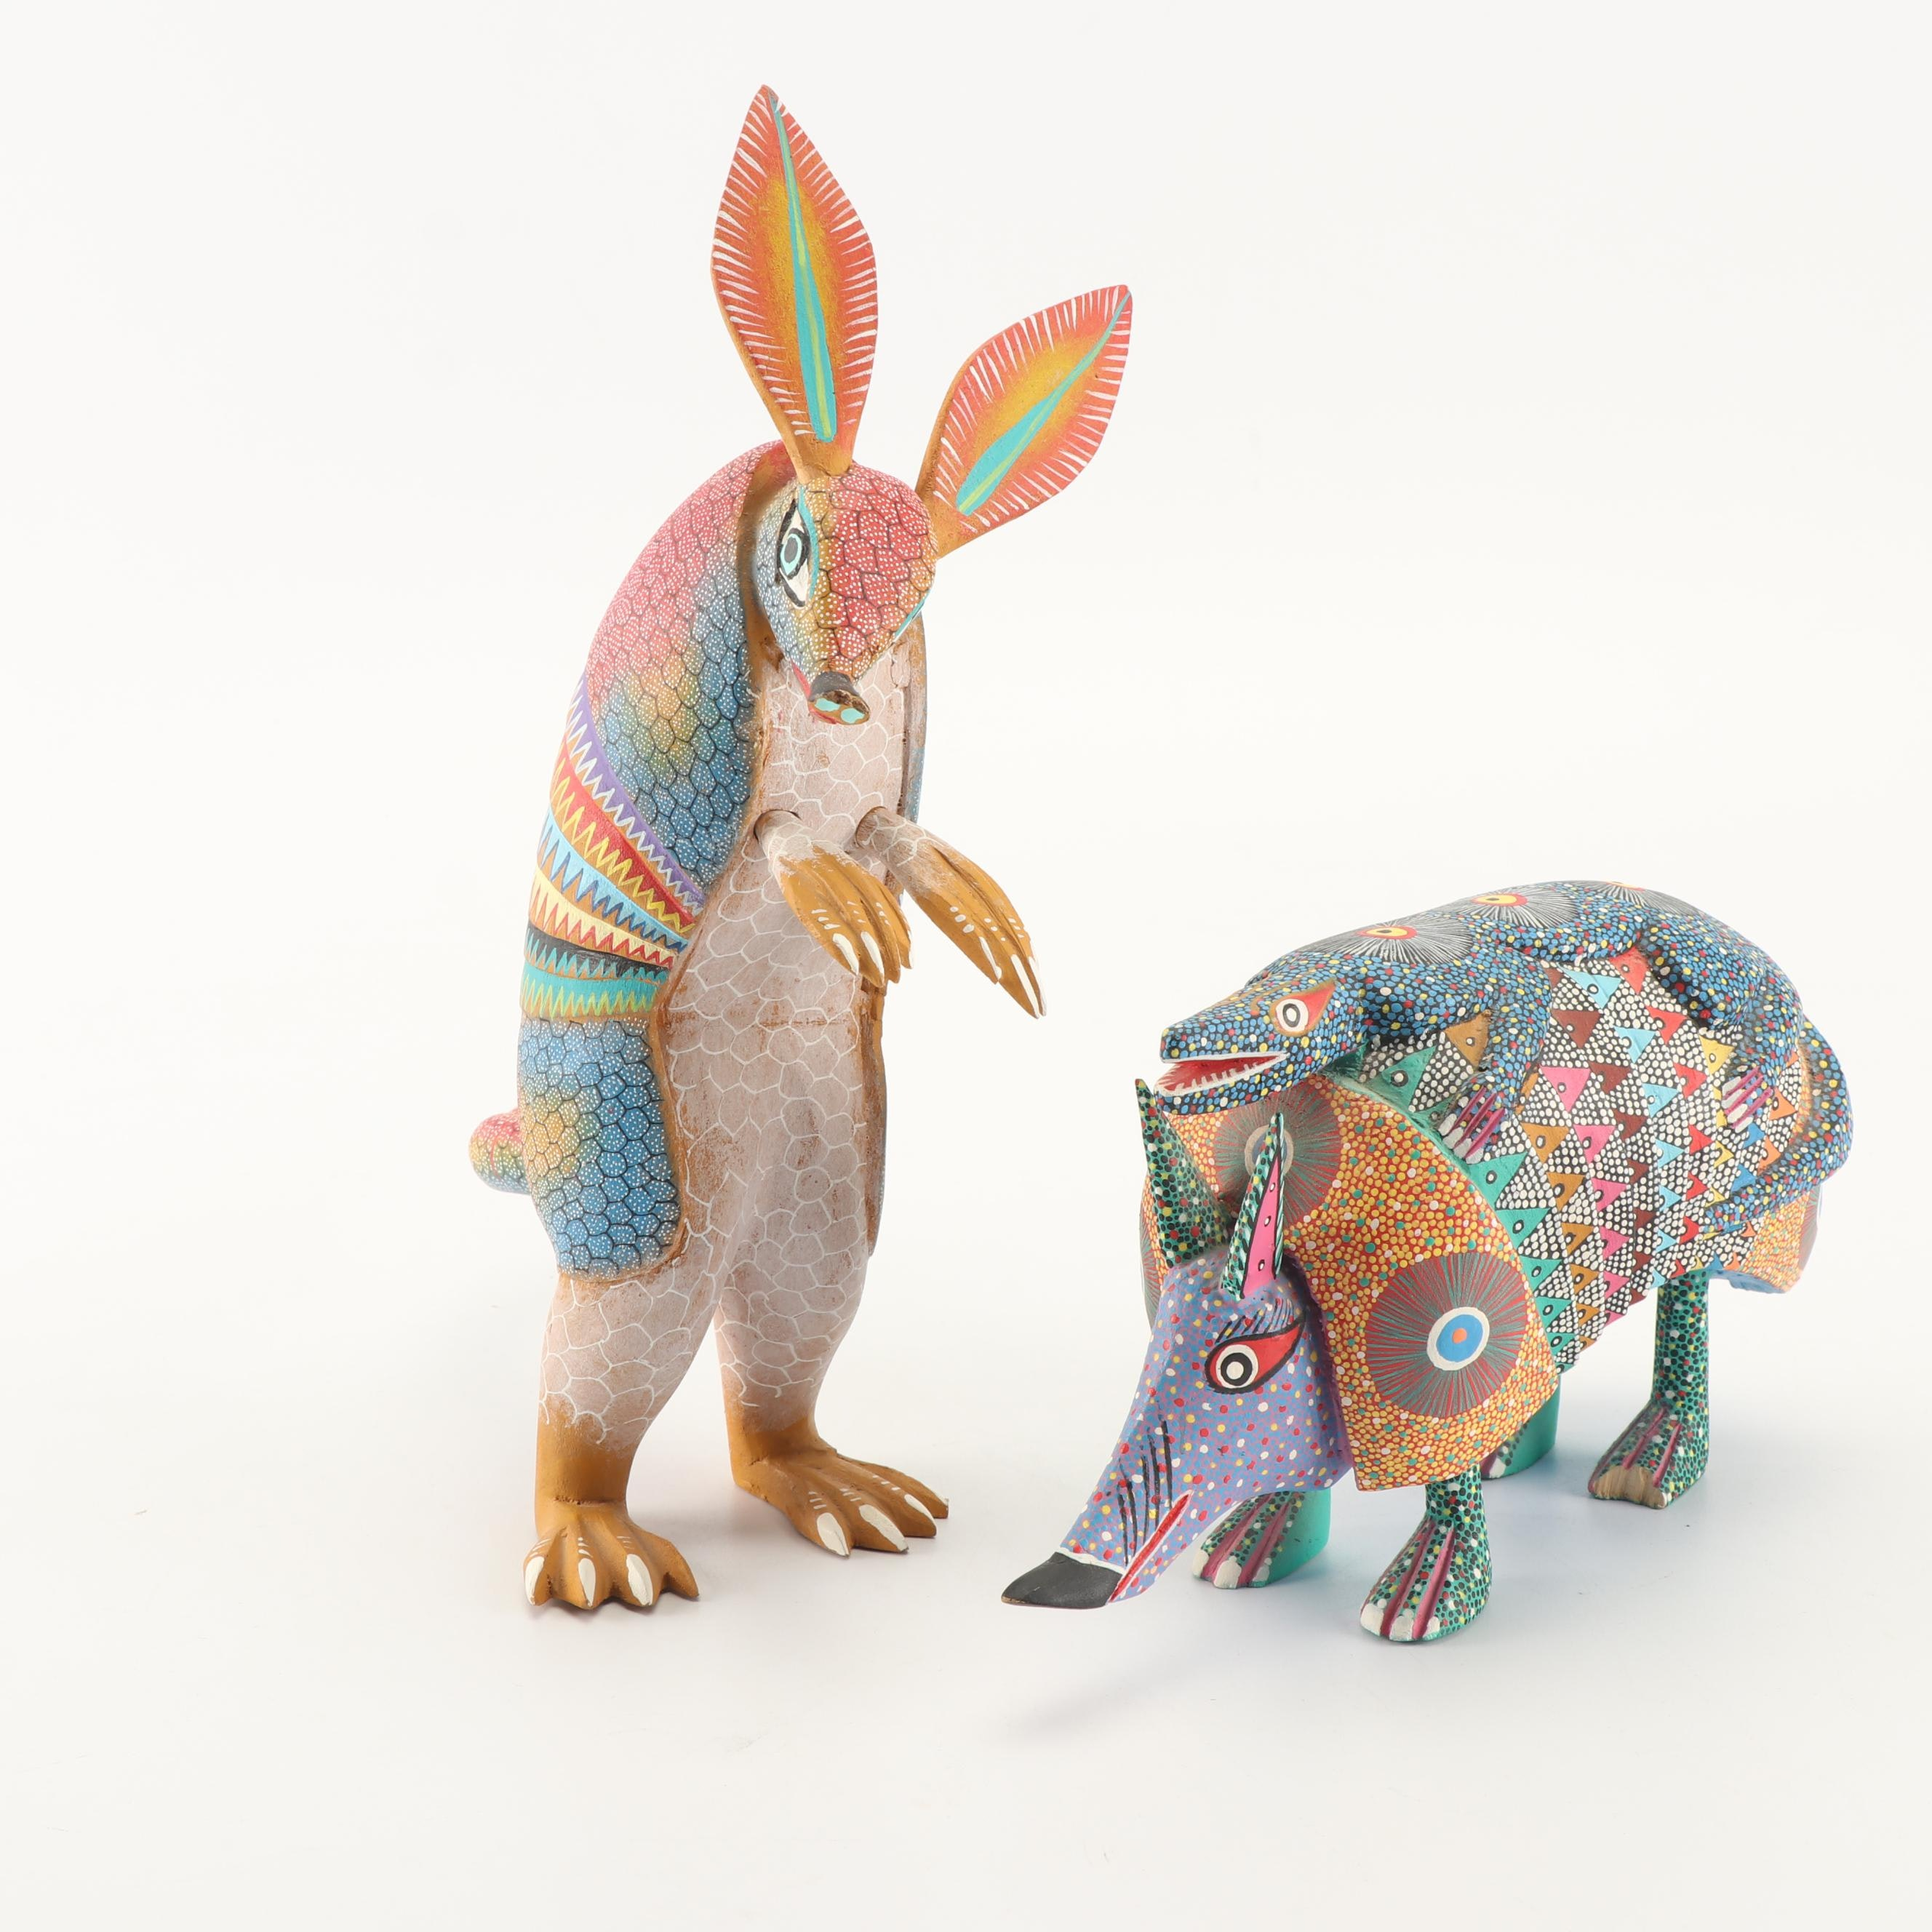 Signed Mexican Folk Art Armadillo Figurines